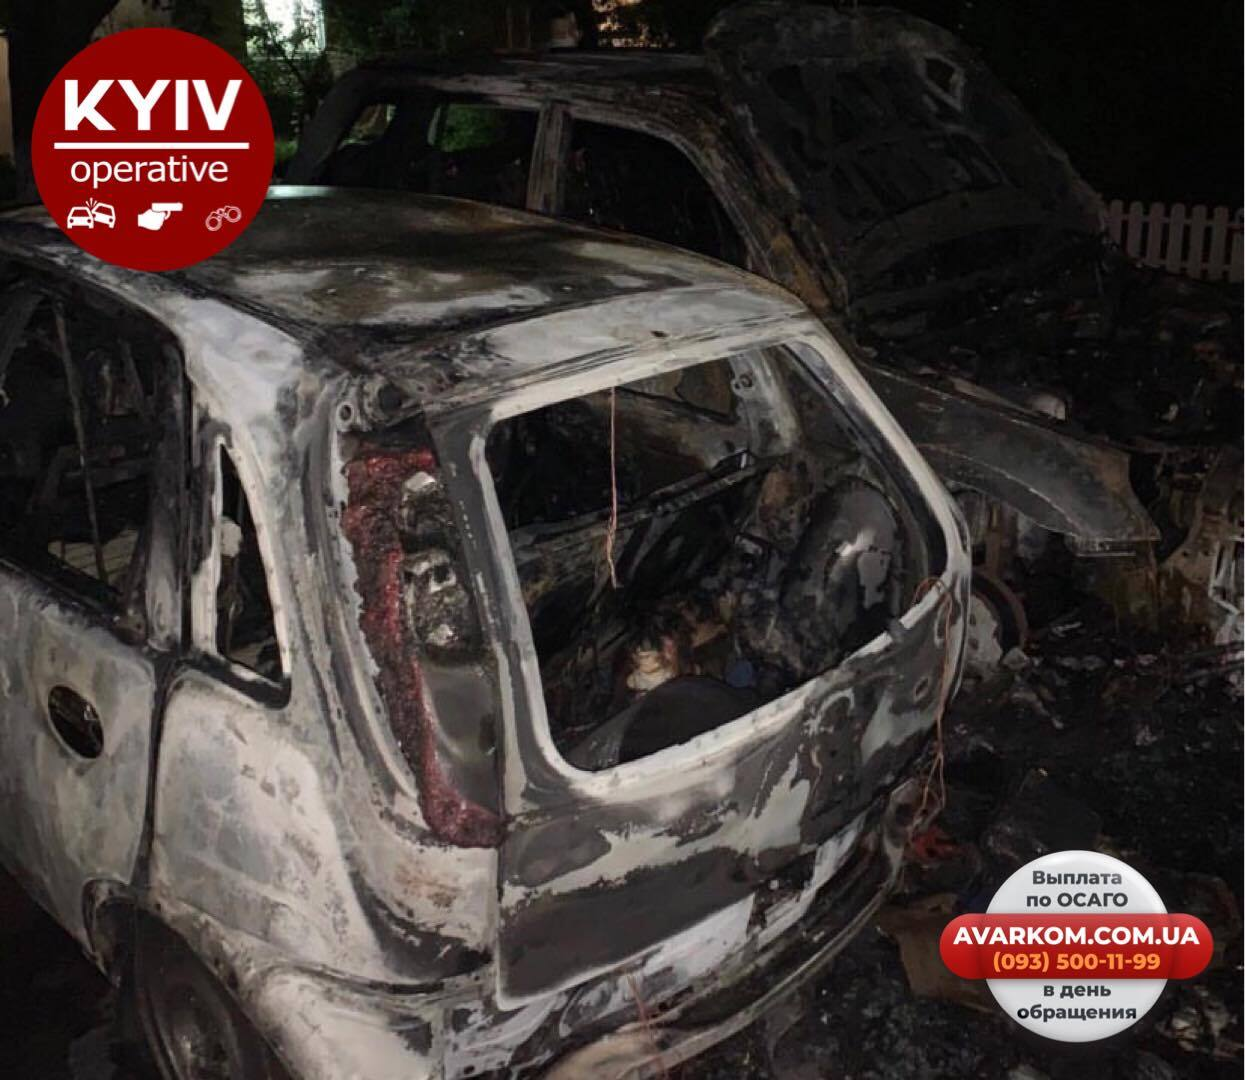 У Києві трапилася пожежа на парковці